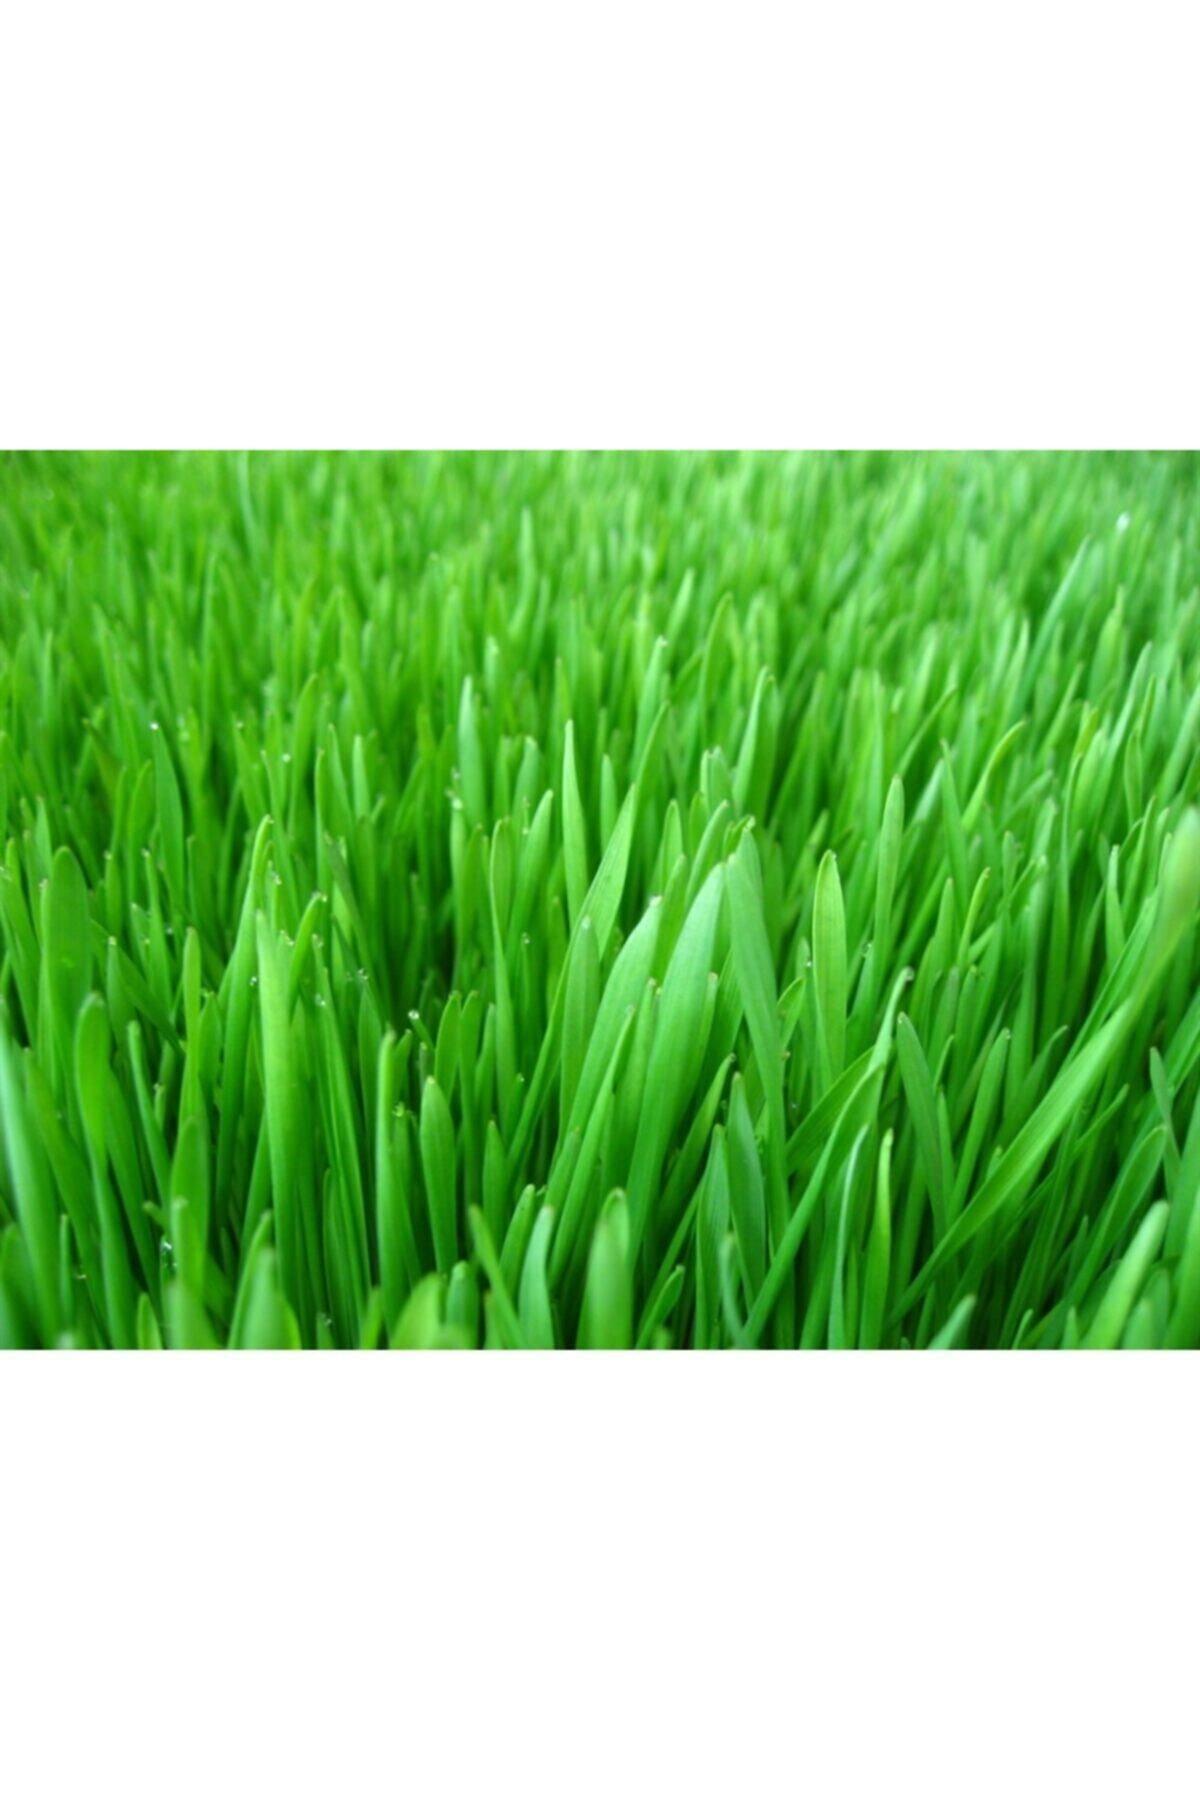 GRASS MIXTURE 4 Çeşit Çim Tohumu 1 Kg 2